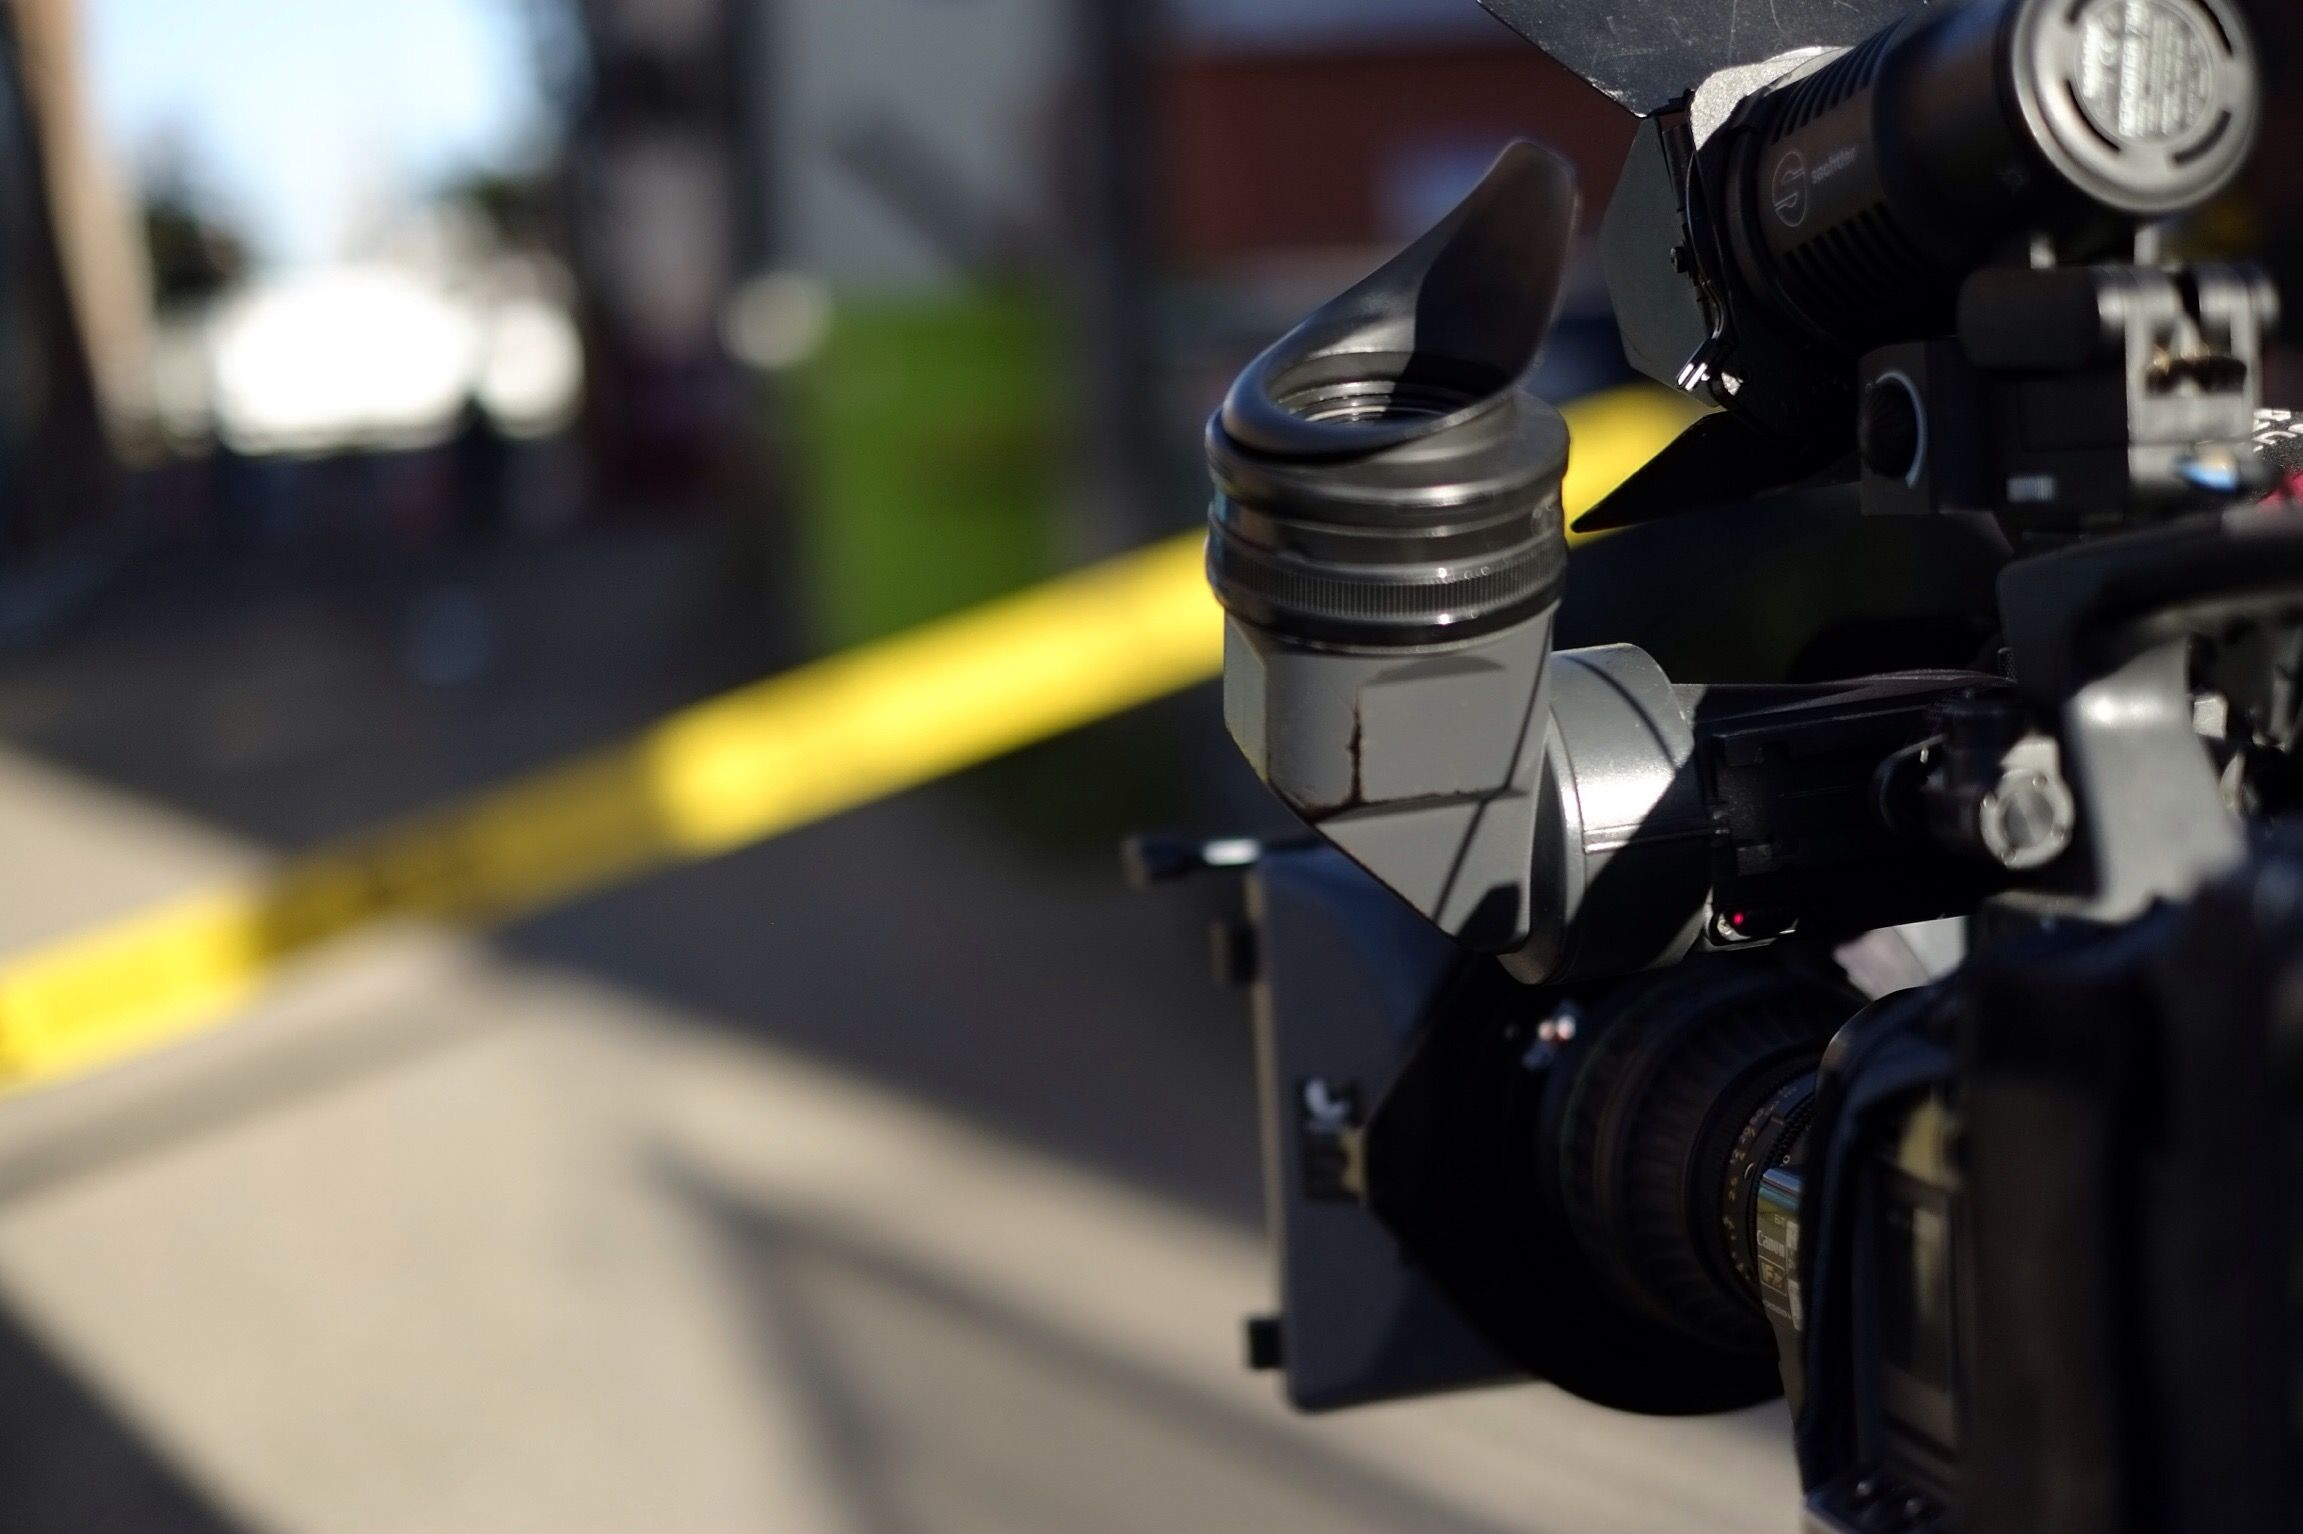 Pin on Crime scene photography